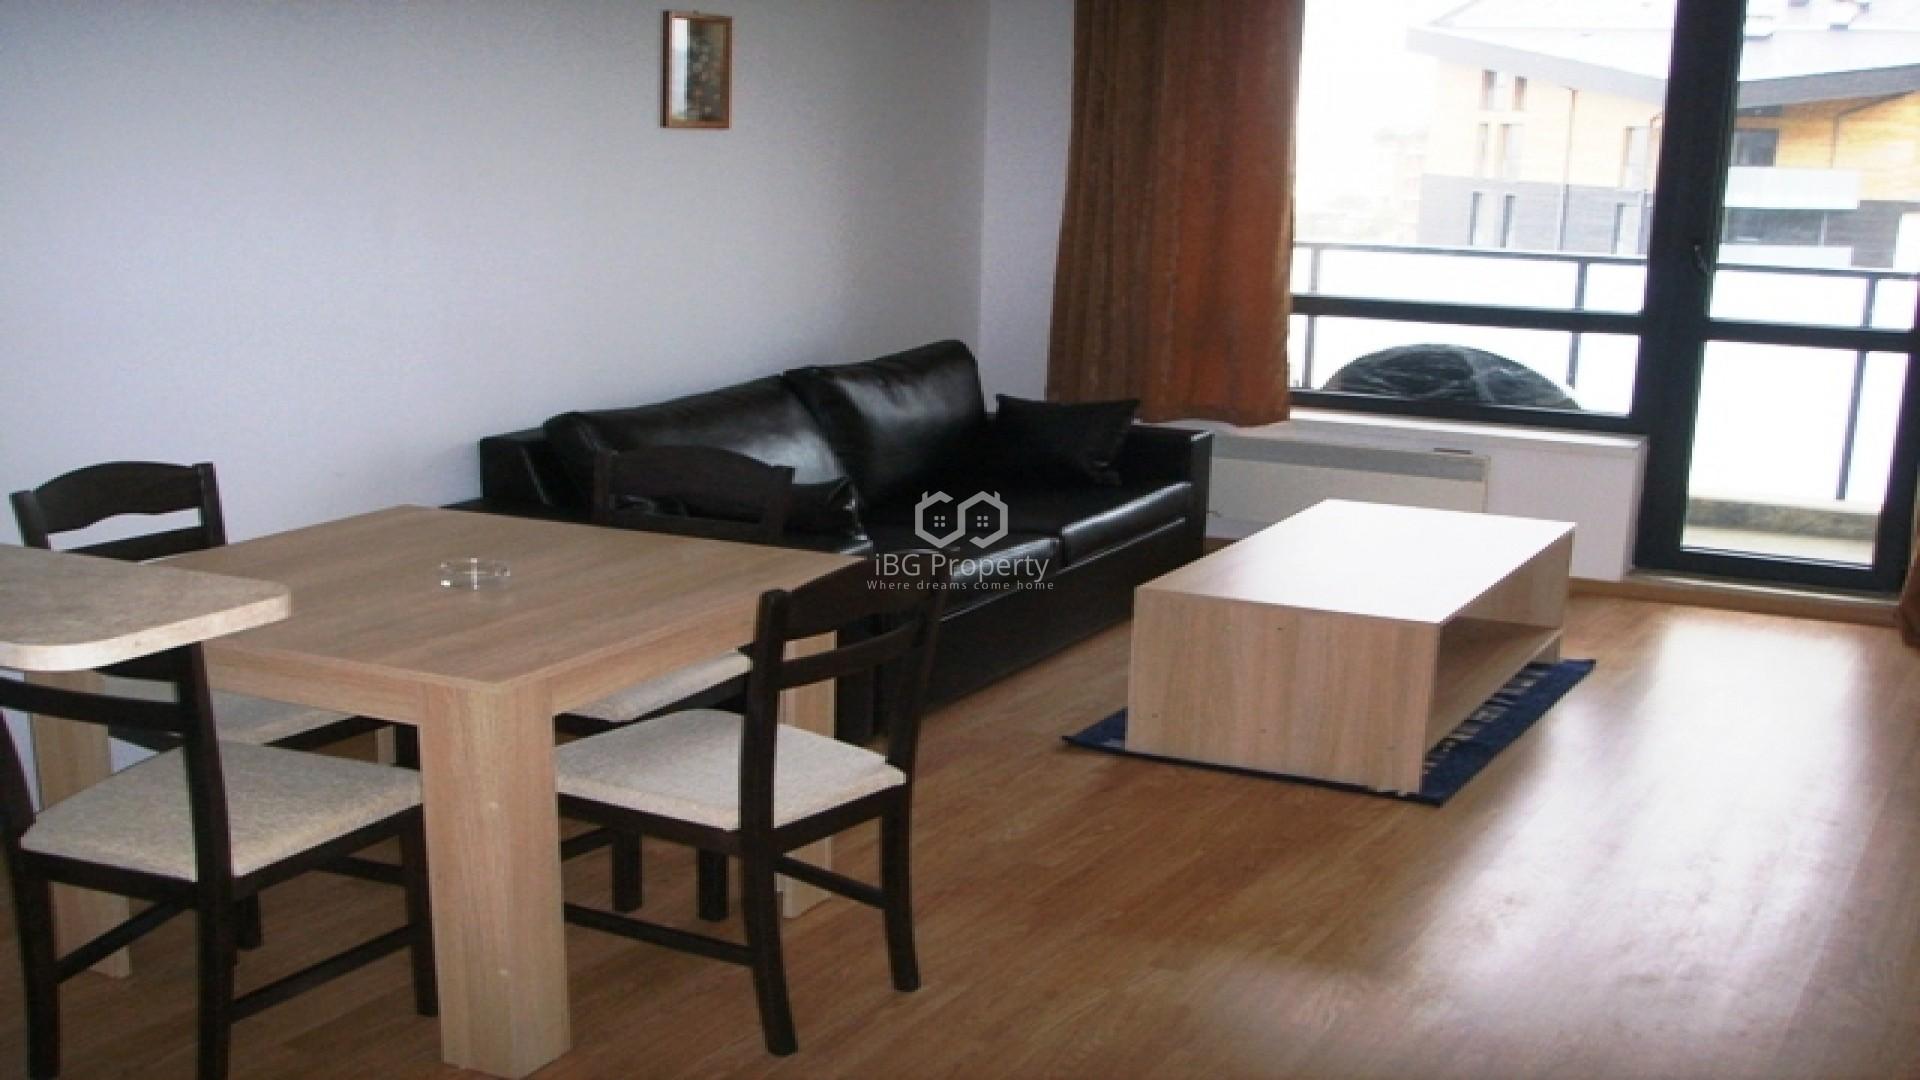 Двухкомнатная квартира Банско 64 m2